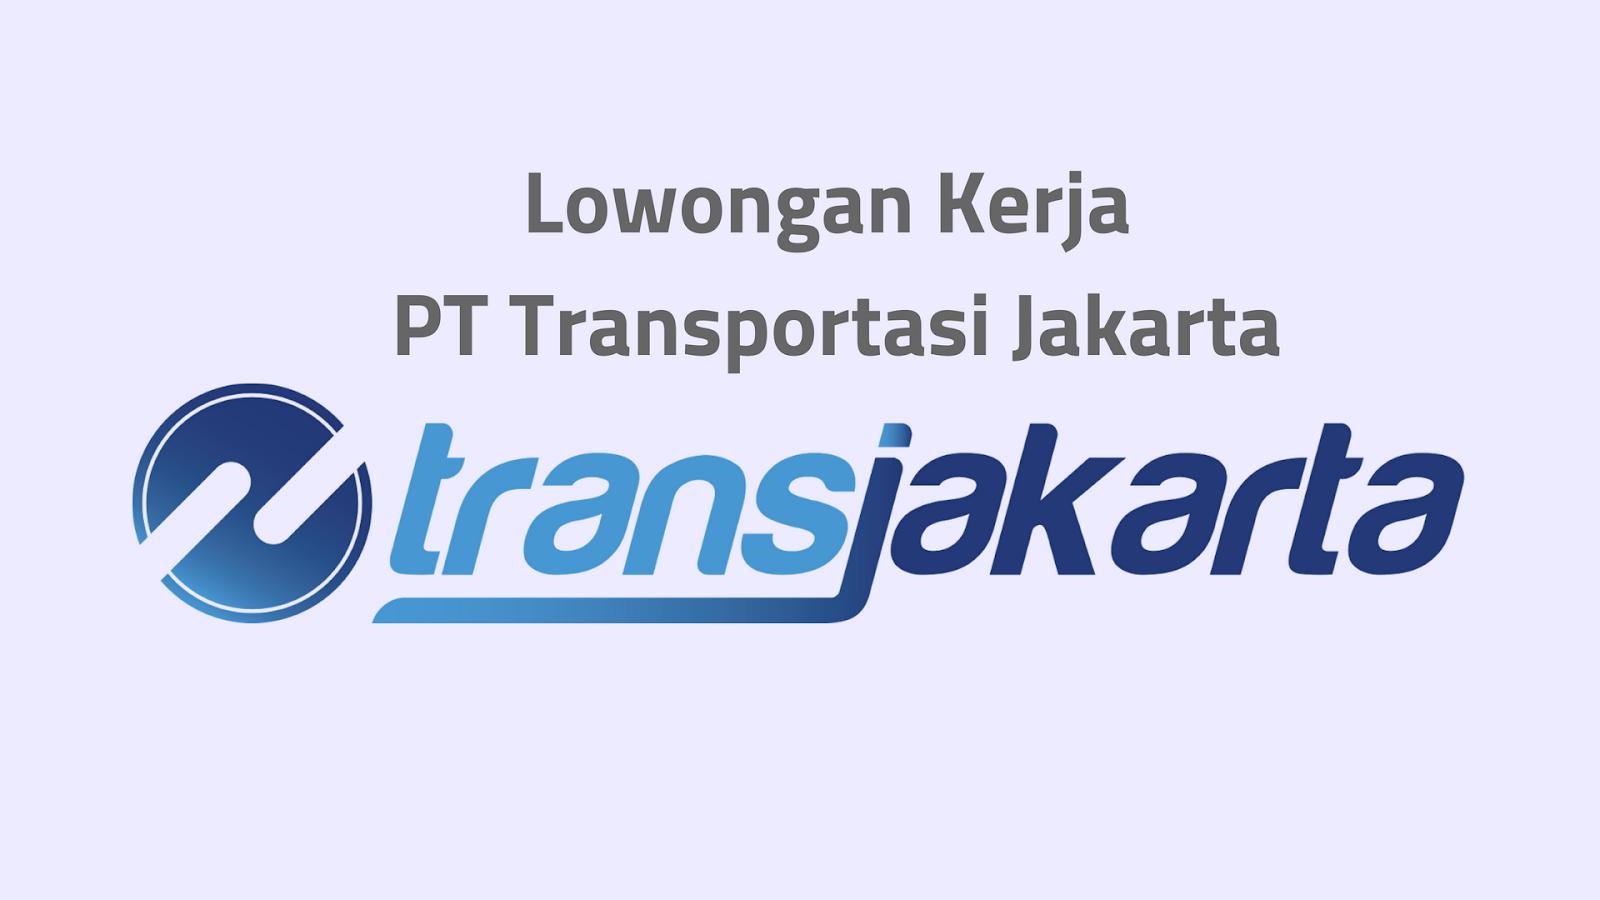 Lowongan Kerja PT Transjakarta